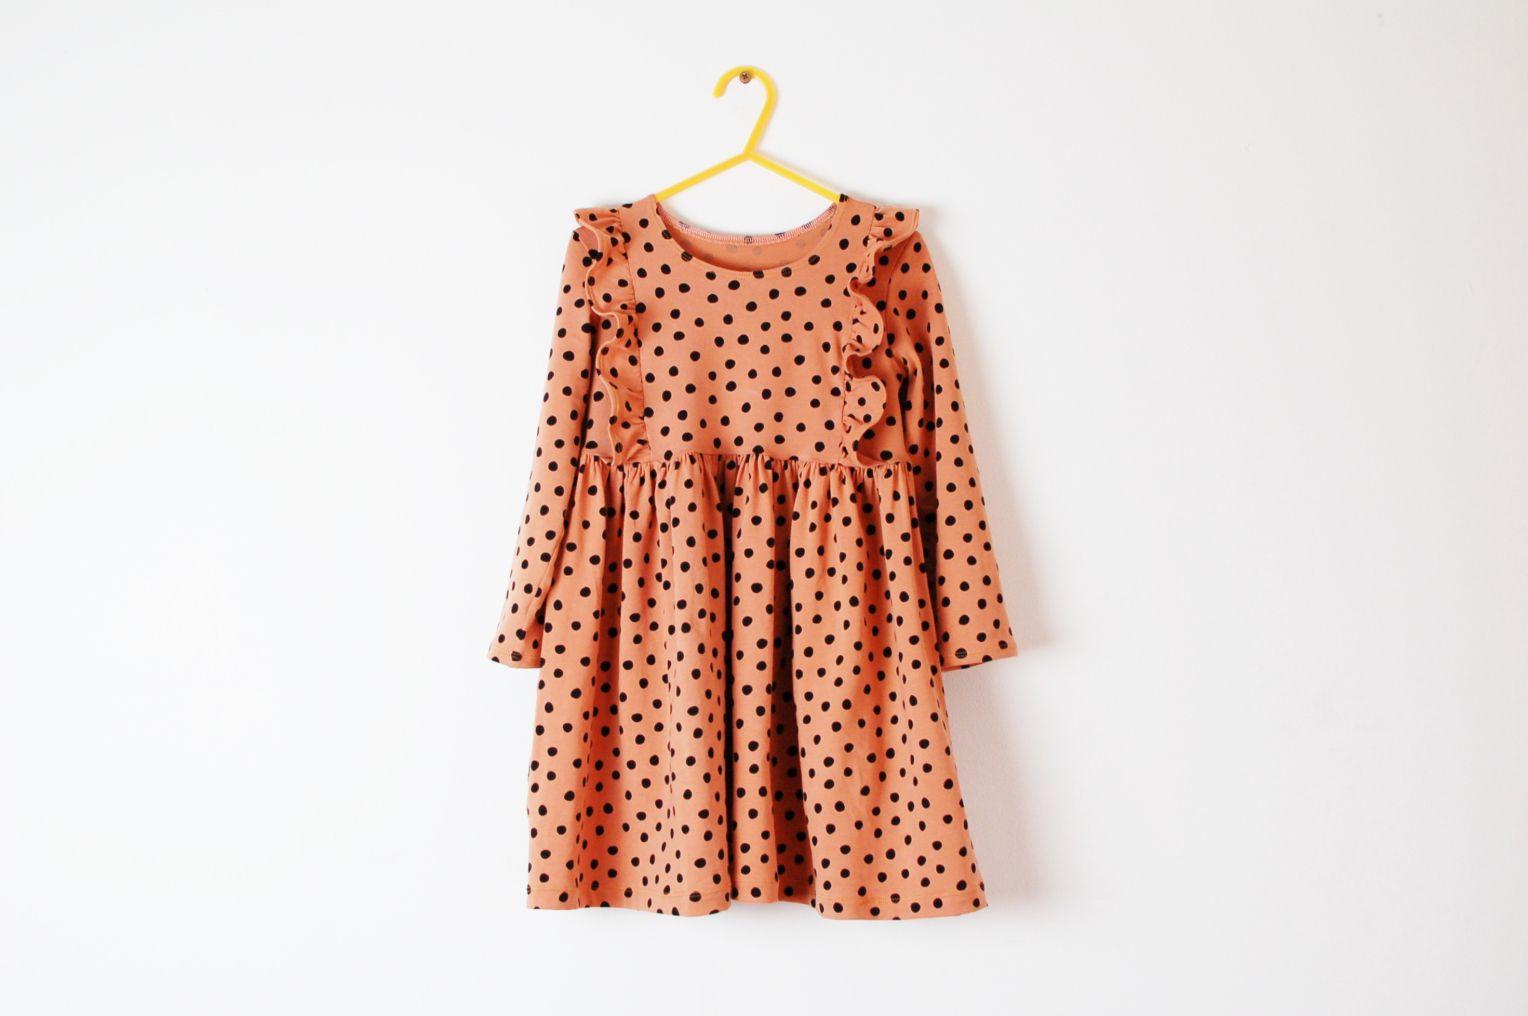 0c6960c2e0 Free Millie dress pattern in Nosh Organics jersey